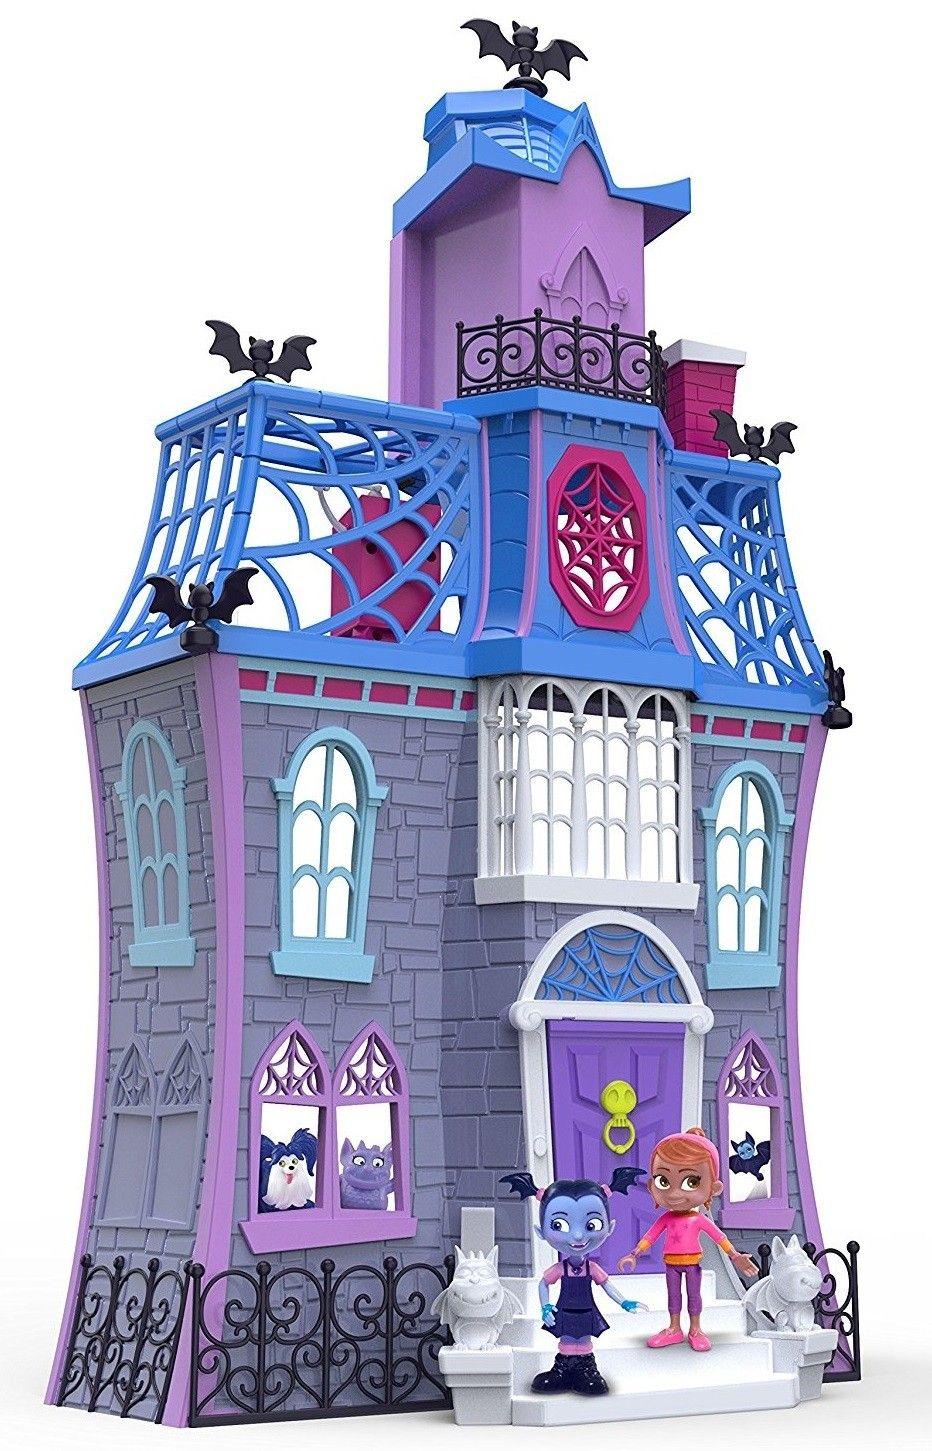 Disney Vampirina Scare B/&B Playset House Spooky Action Figures Family Play House